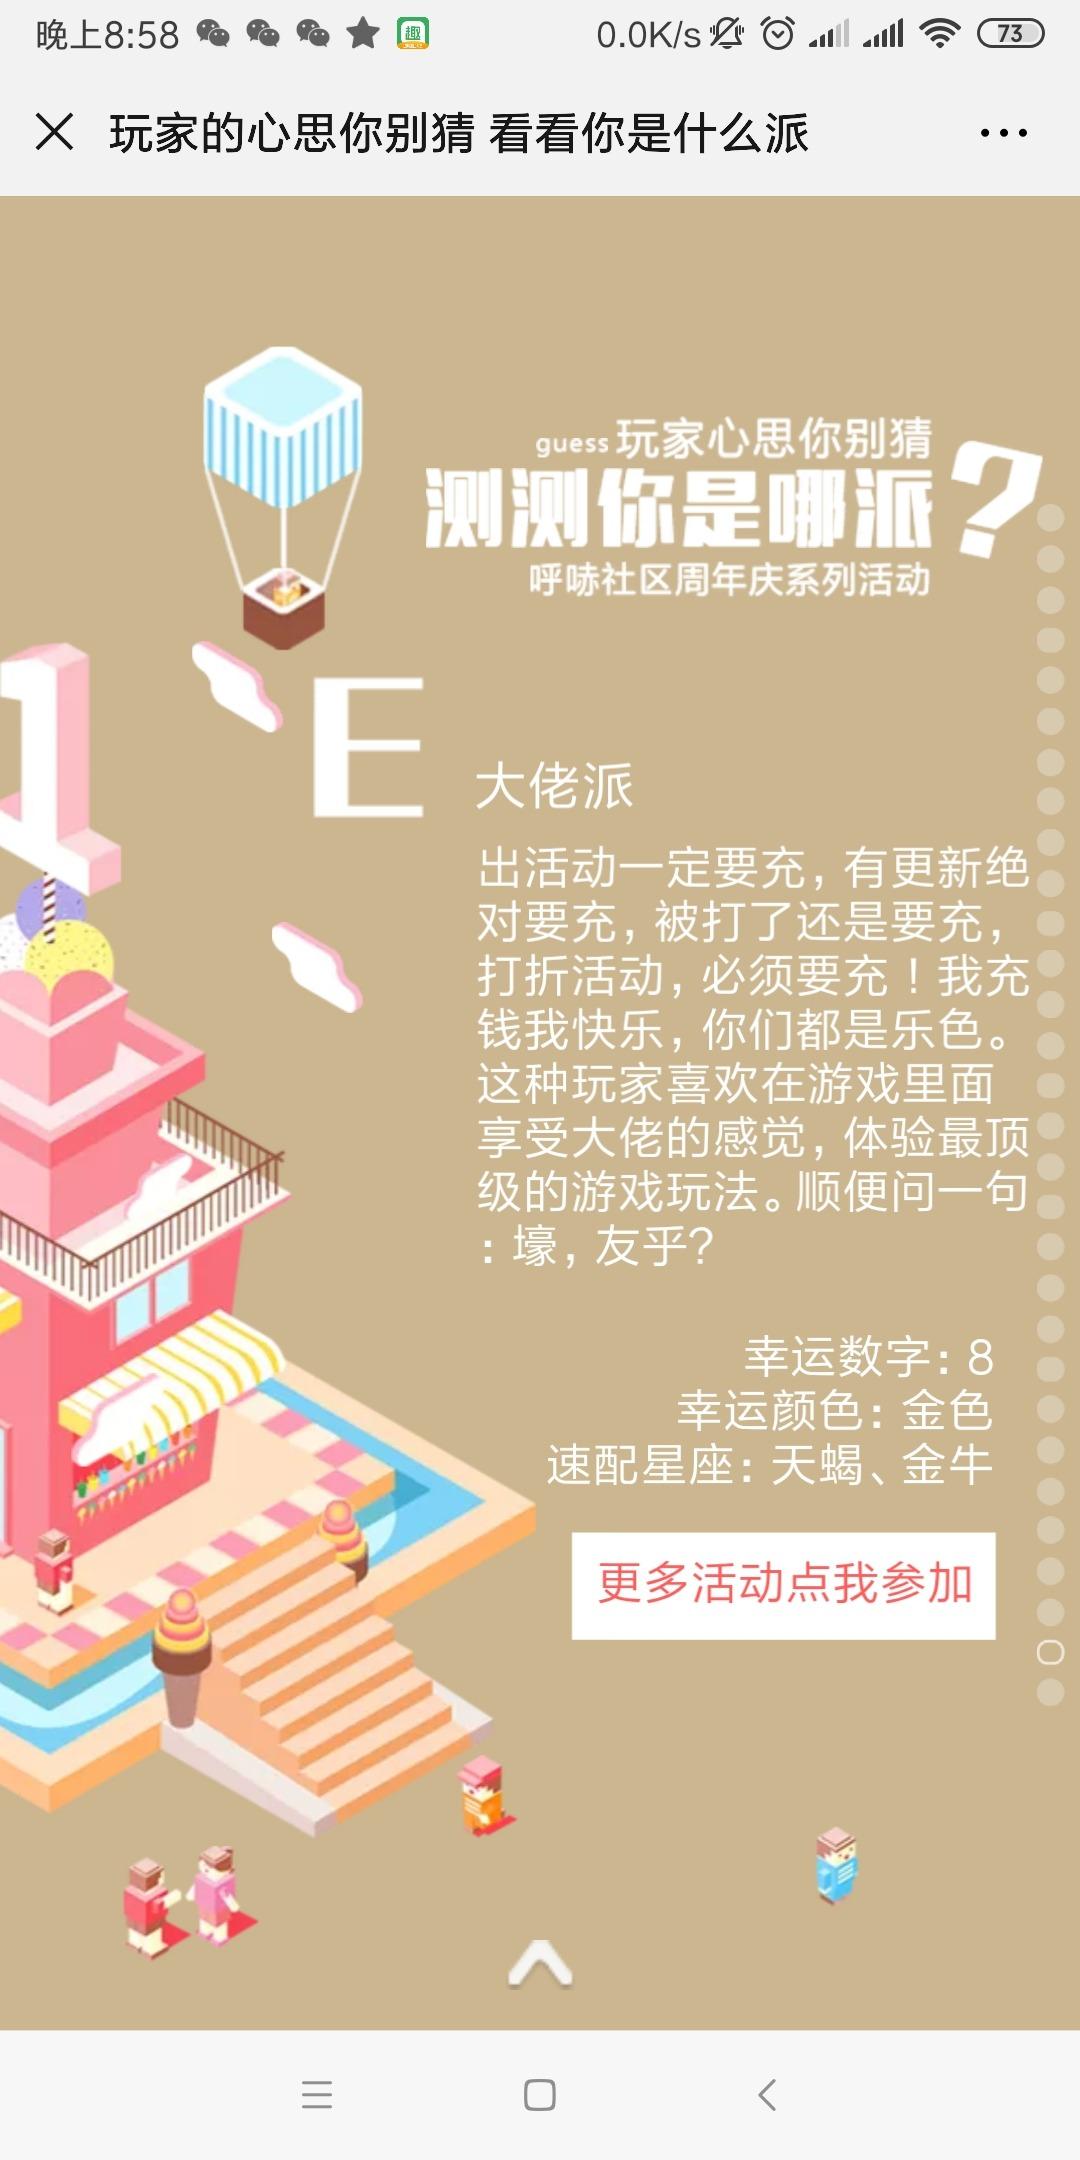 Screenshot_2019-07-25-20-58-01-222_com.tencent.mm.jpg